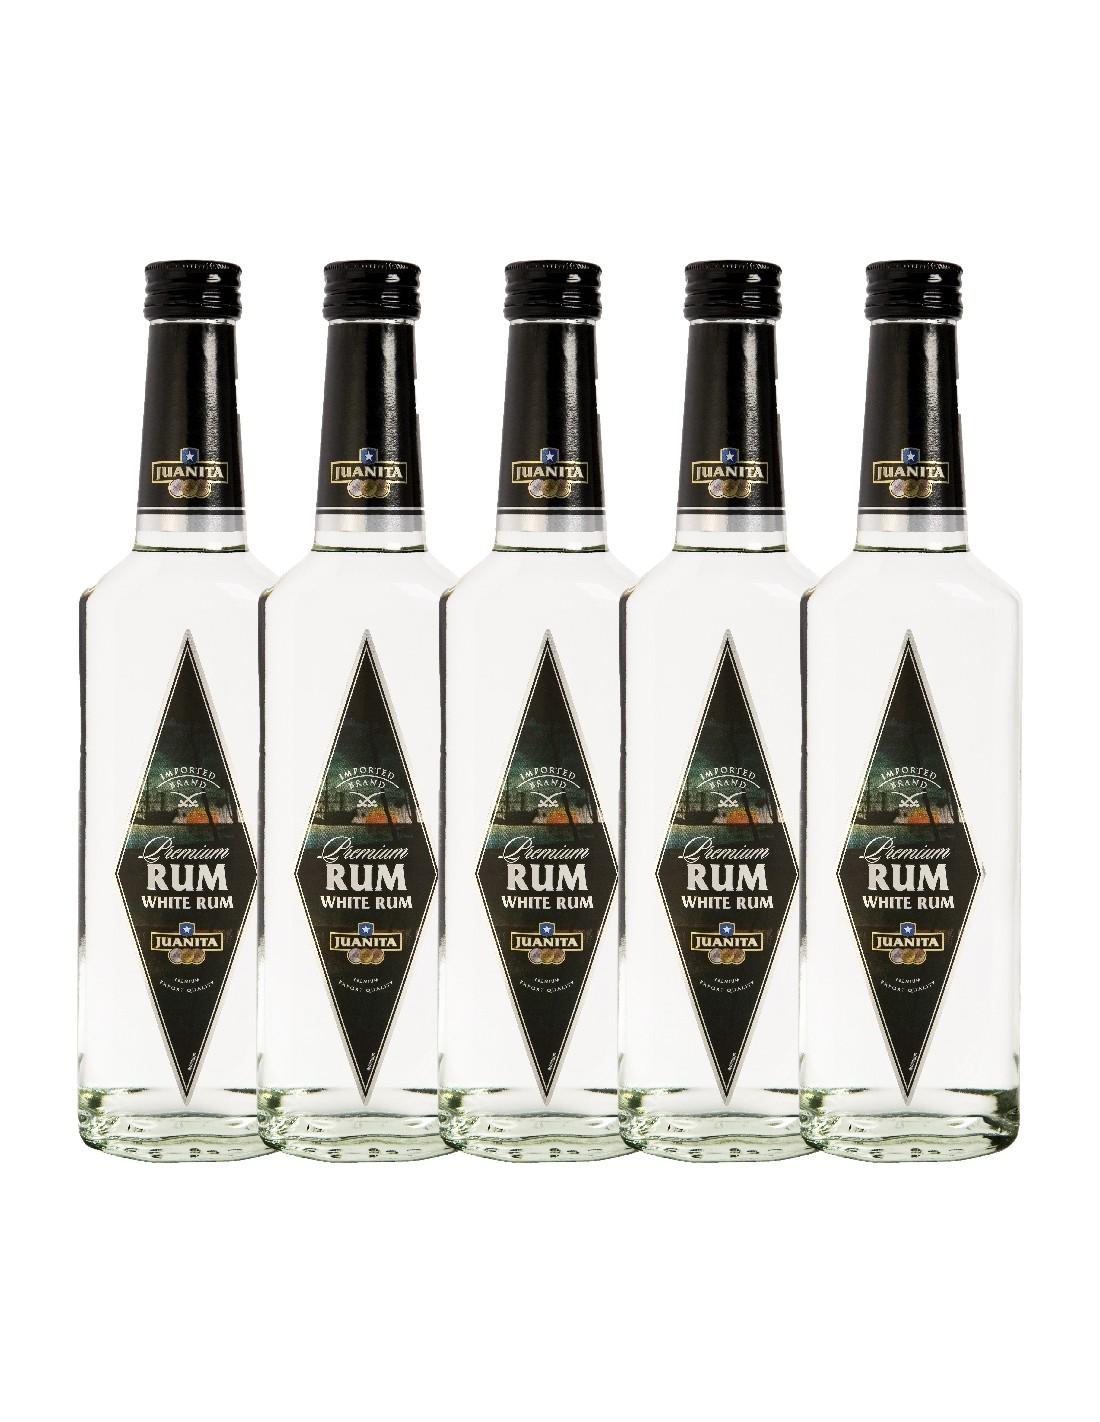 Pachet 5 sticle Rom alb Juanita, 37.5% alc., 0.5L